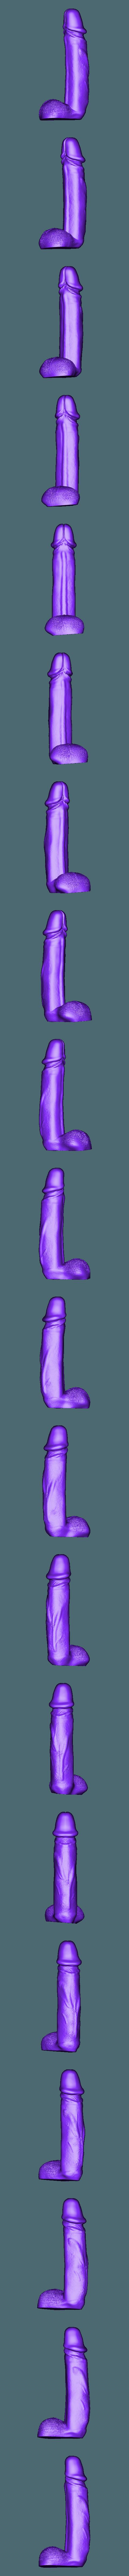 sex homme.stl Download STL file penis, sex • 3D print object, syl39